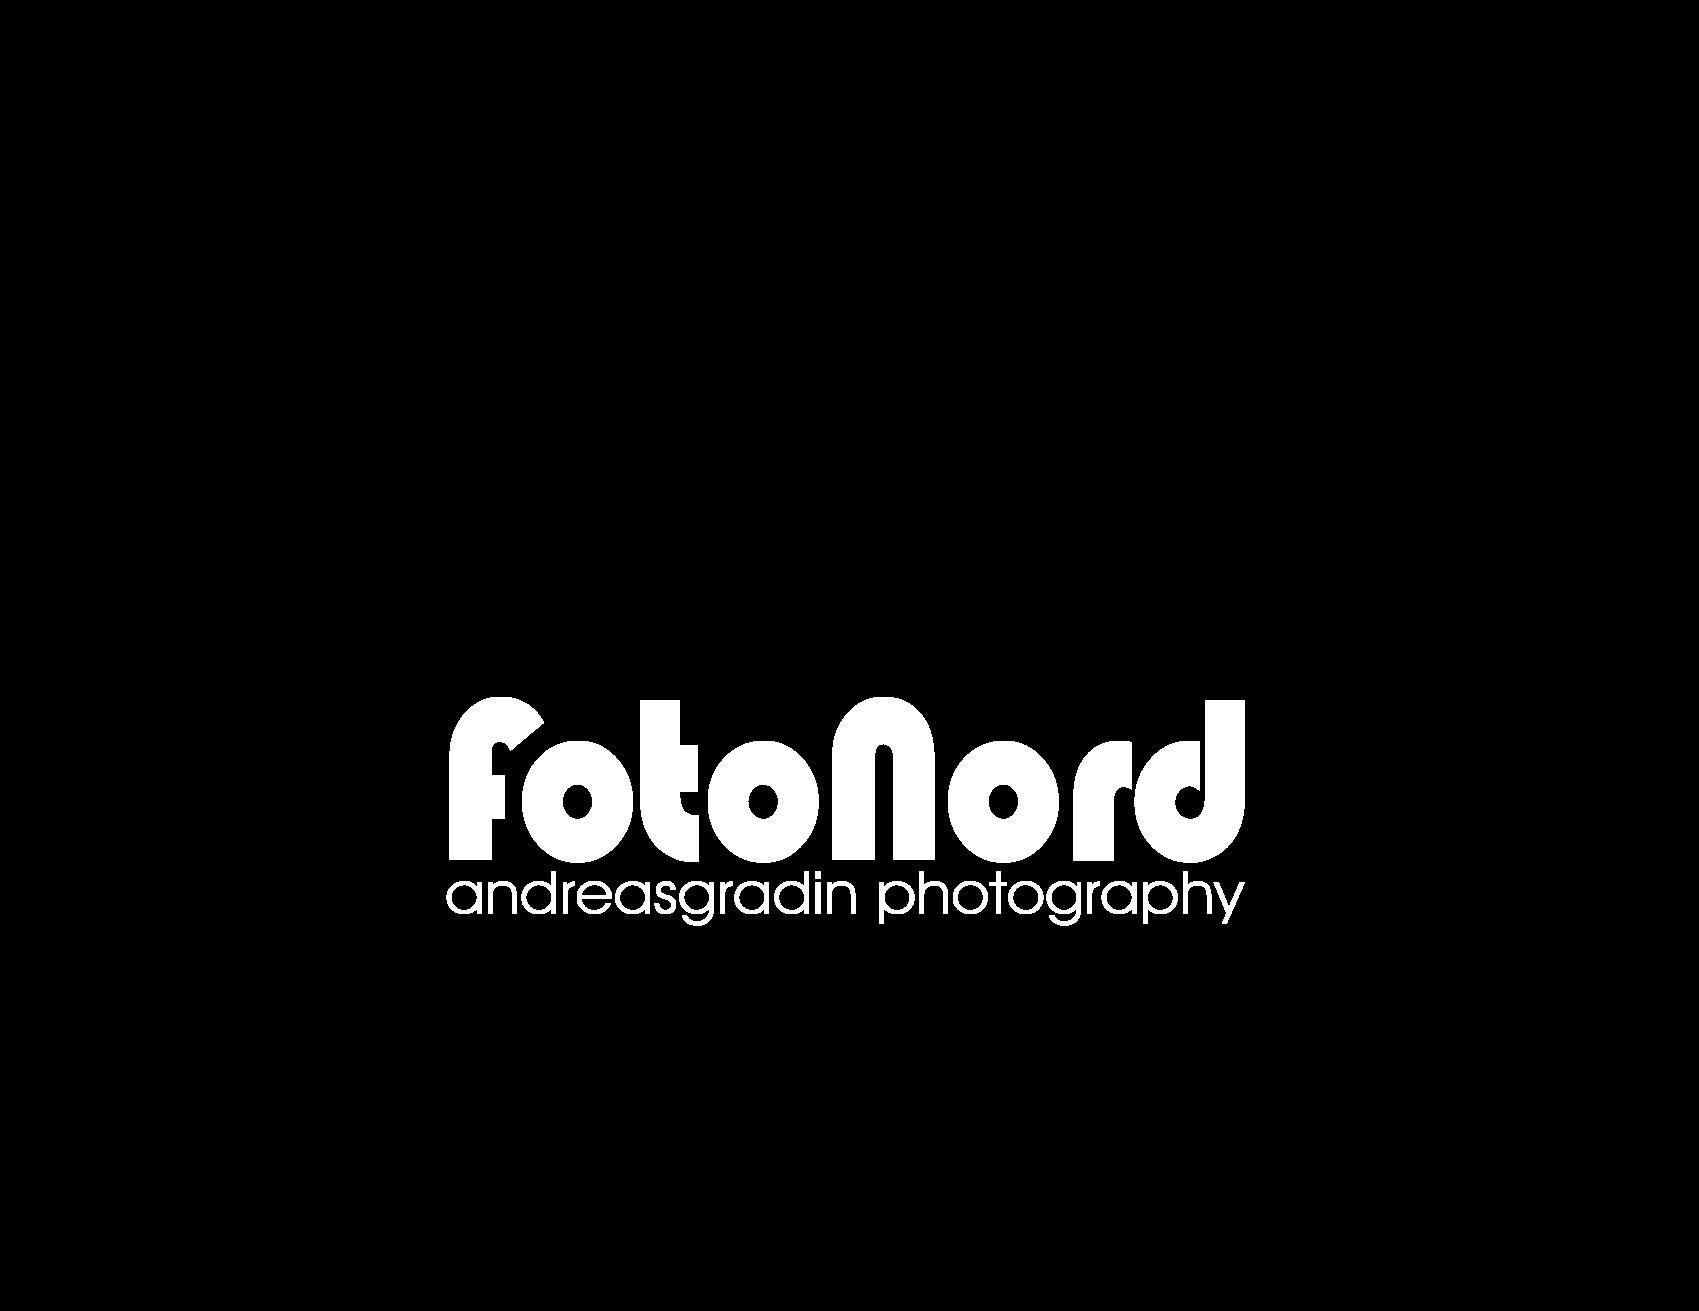 Fotonord logo